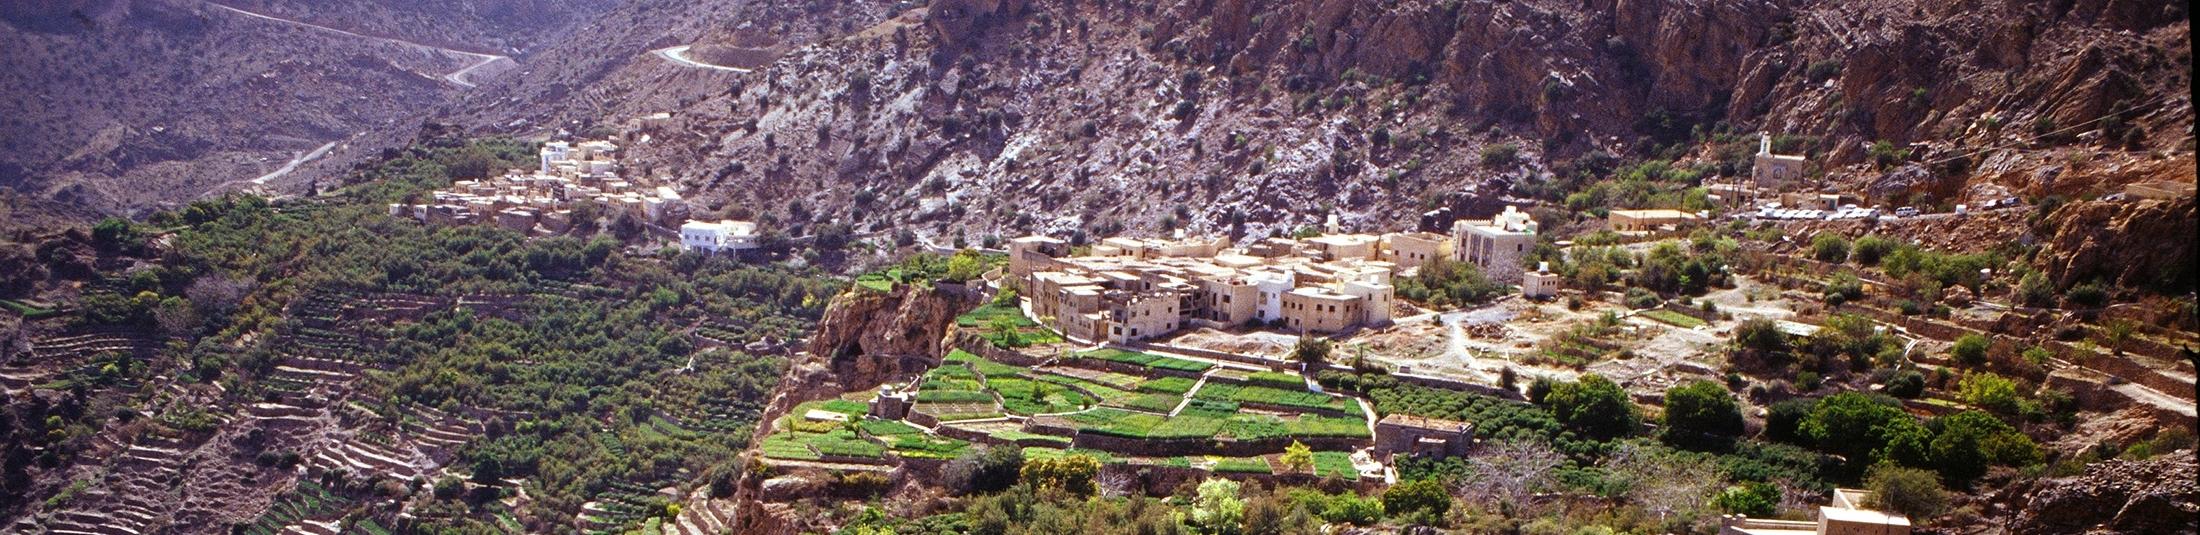 Un Anantara haut perché à Oman - Bannière